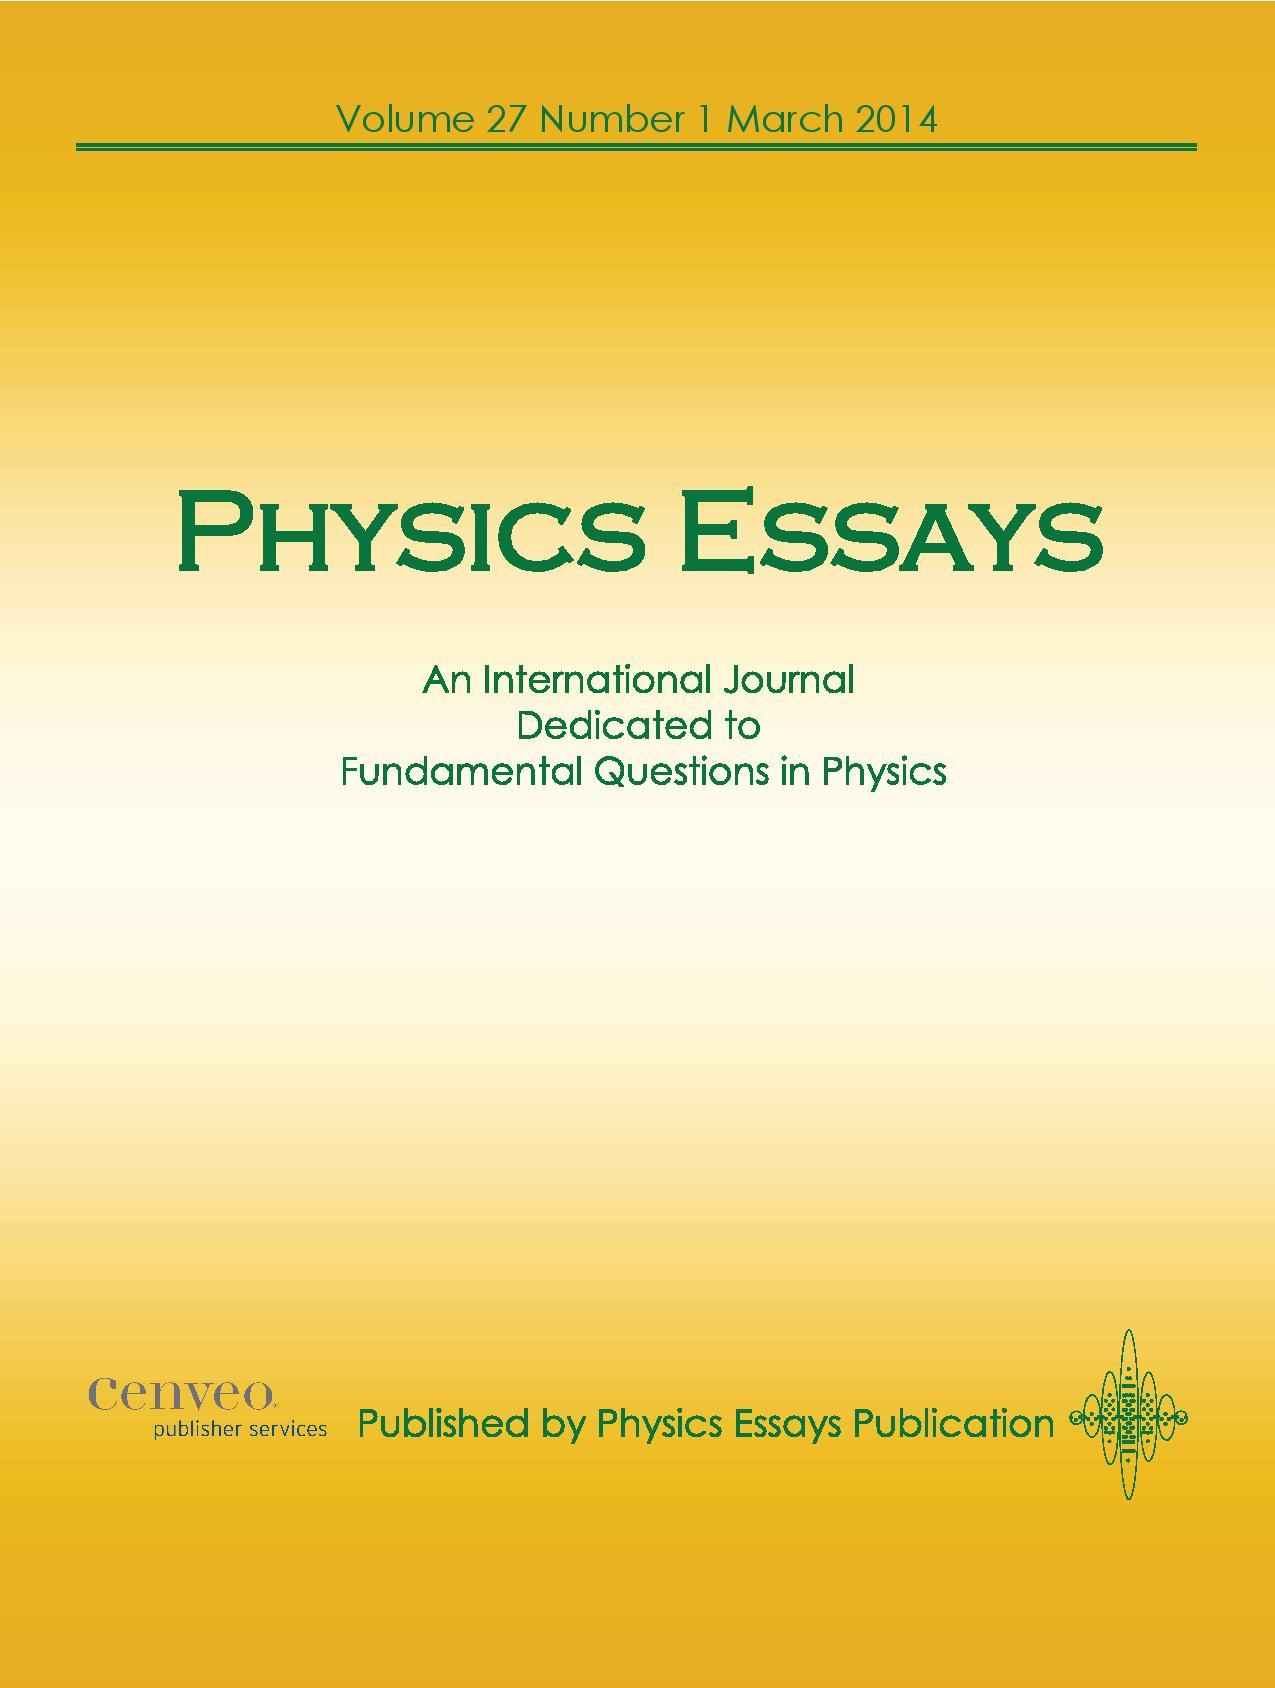 Physics essay publication